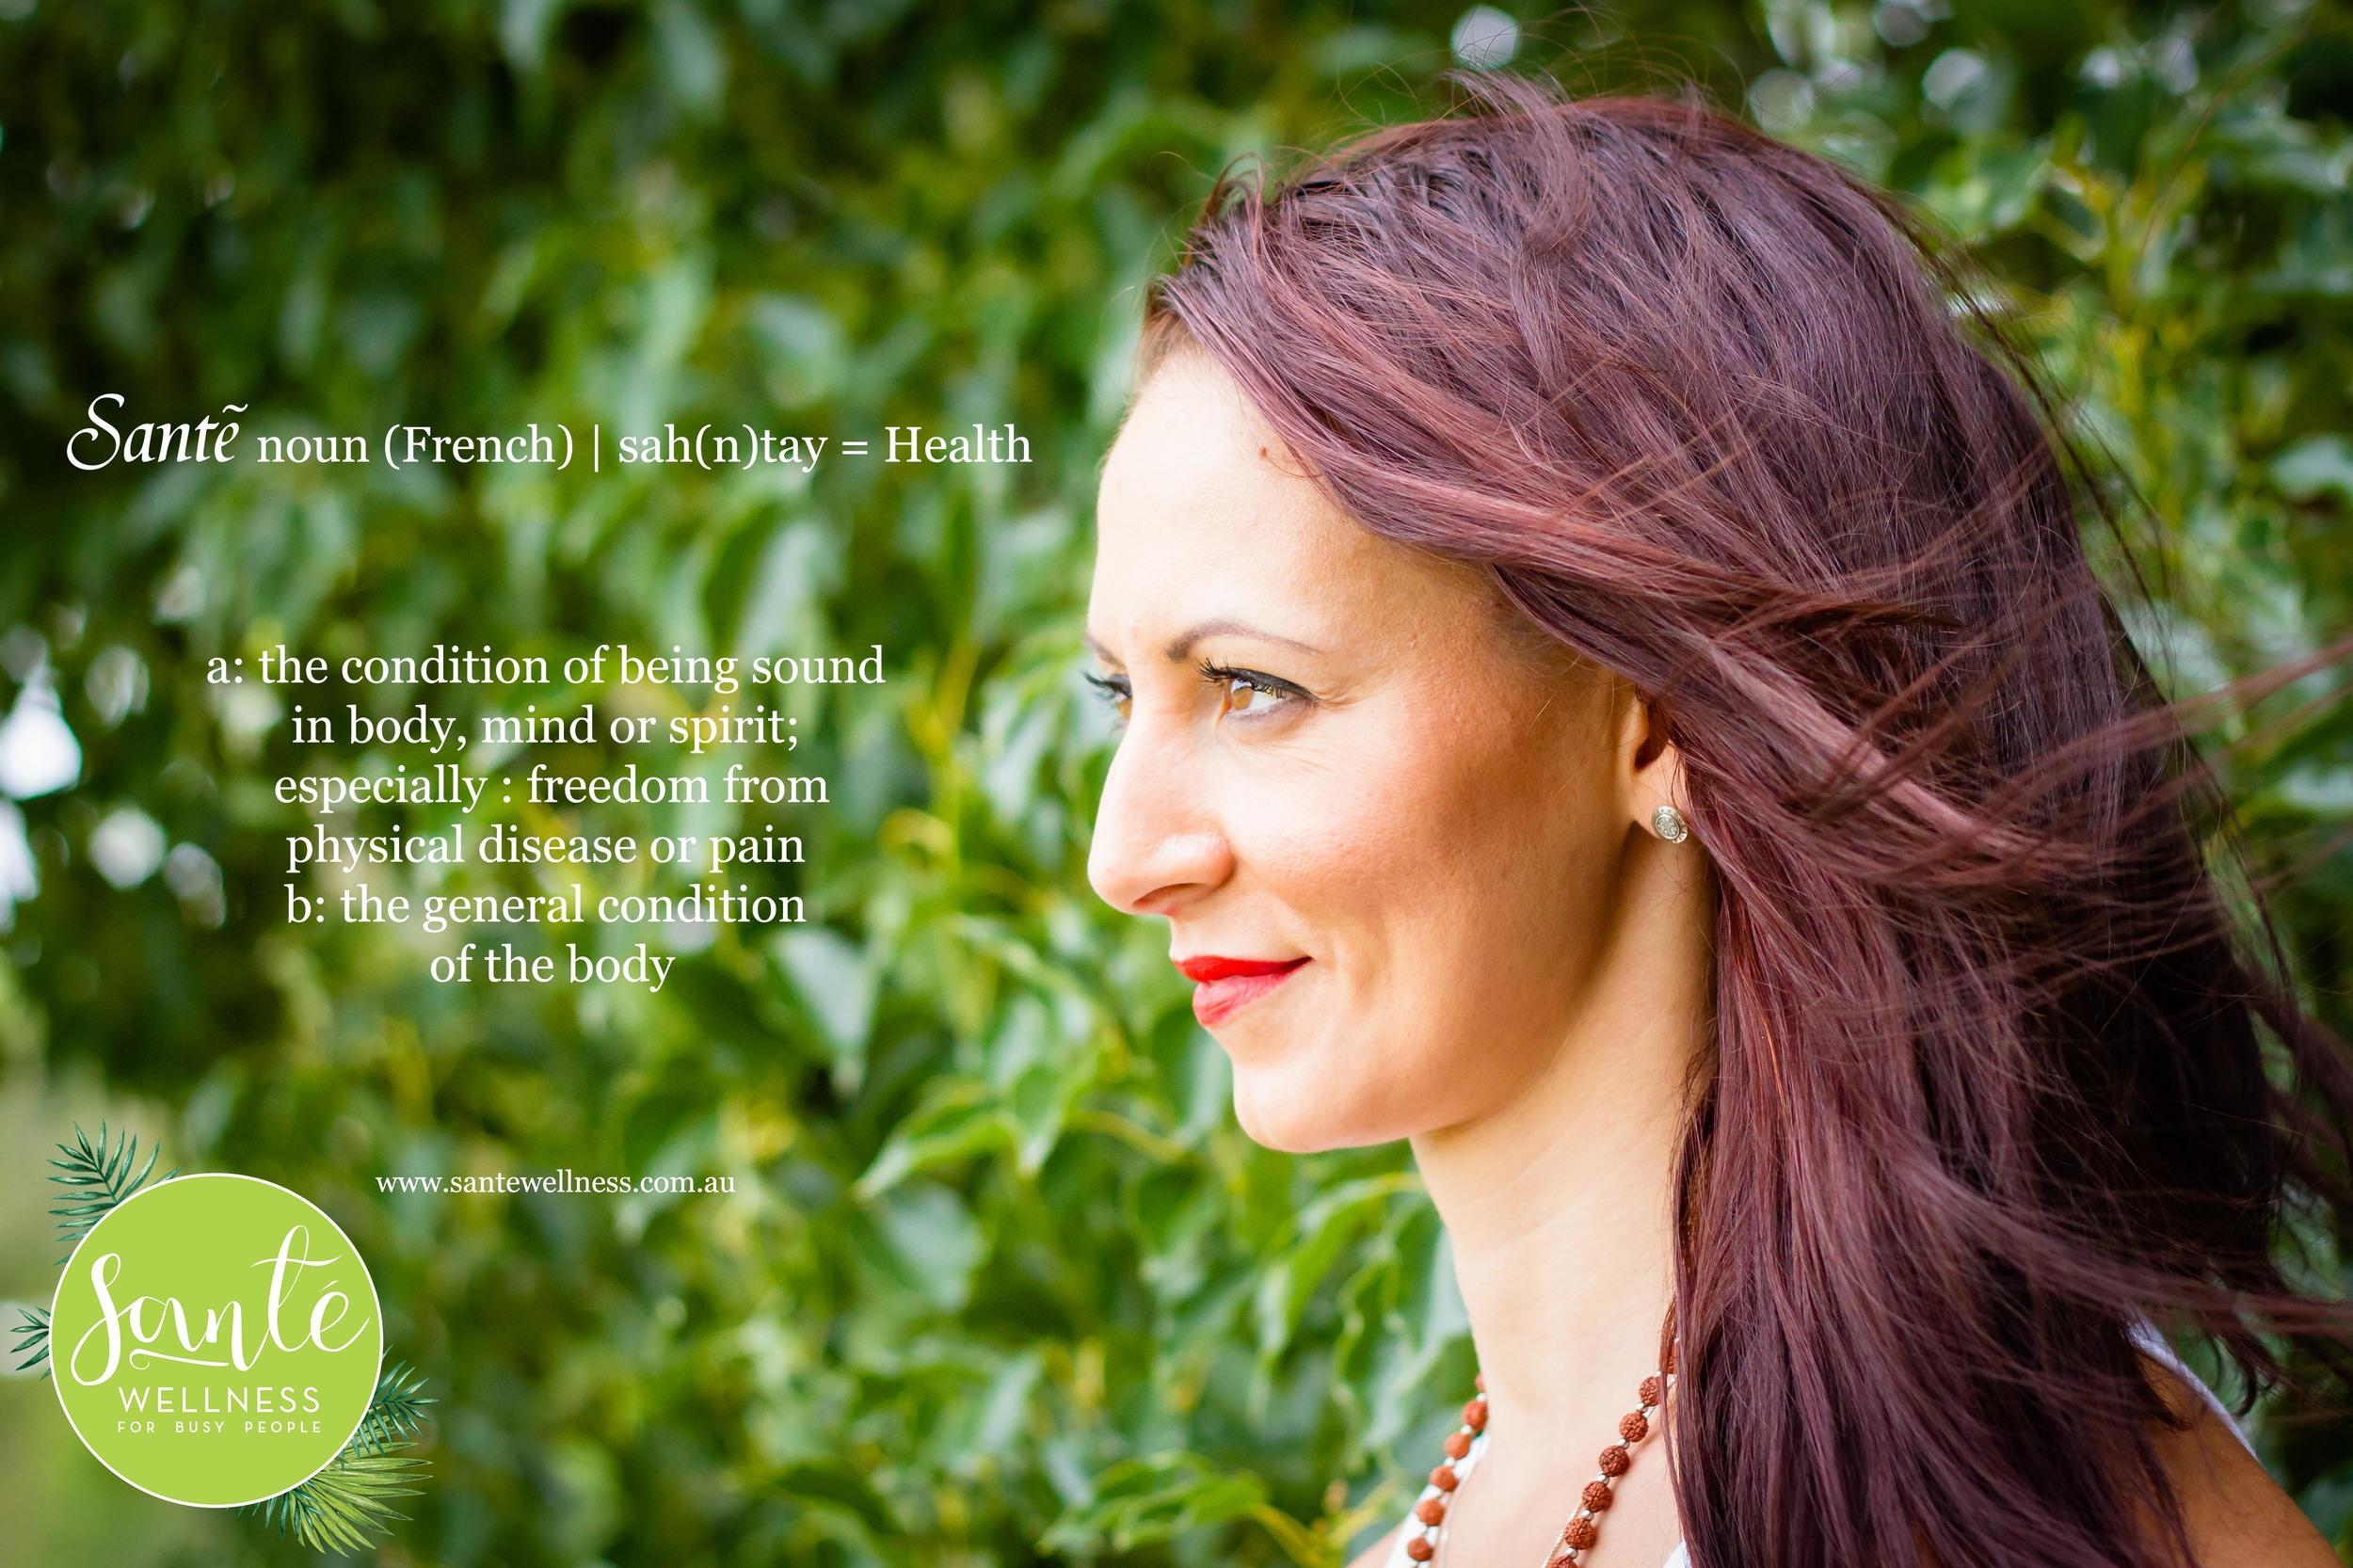 Sante Wellness Brisbane Gold Coast Online Naturopath Zsuzsanna Sipos